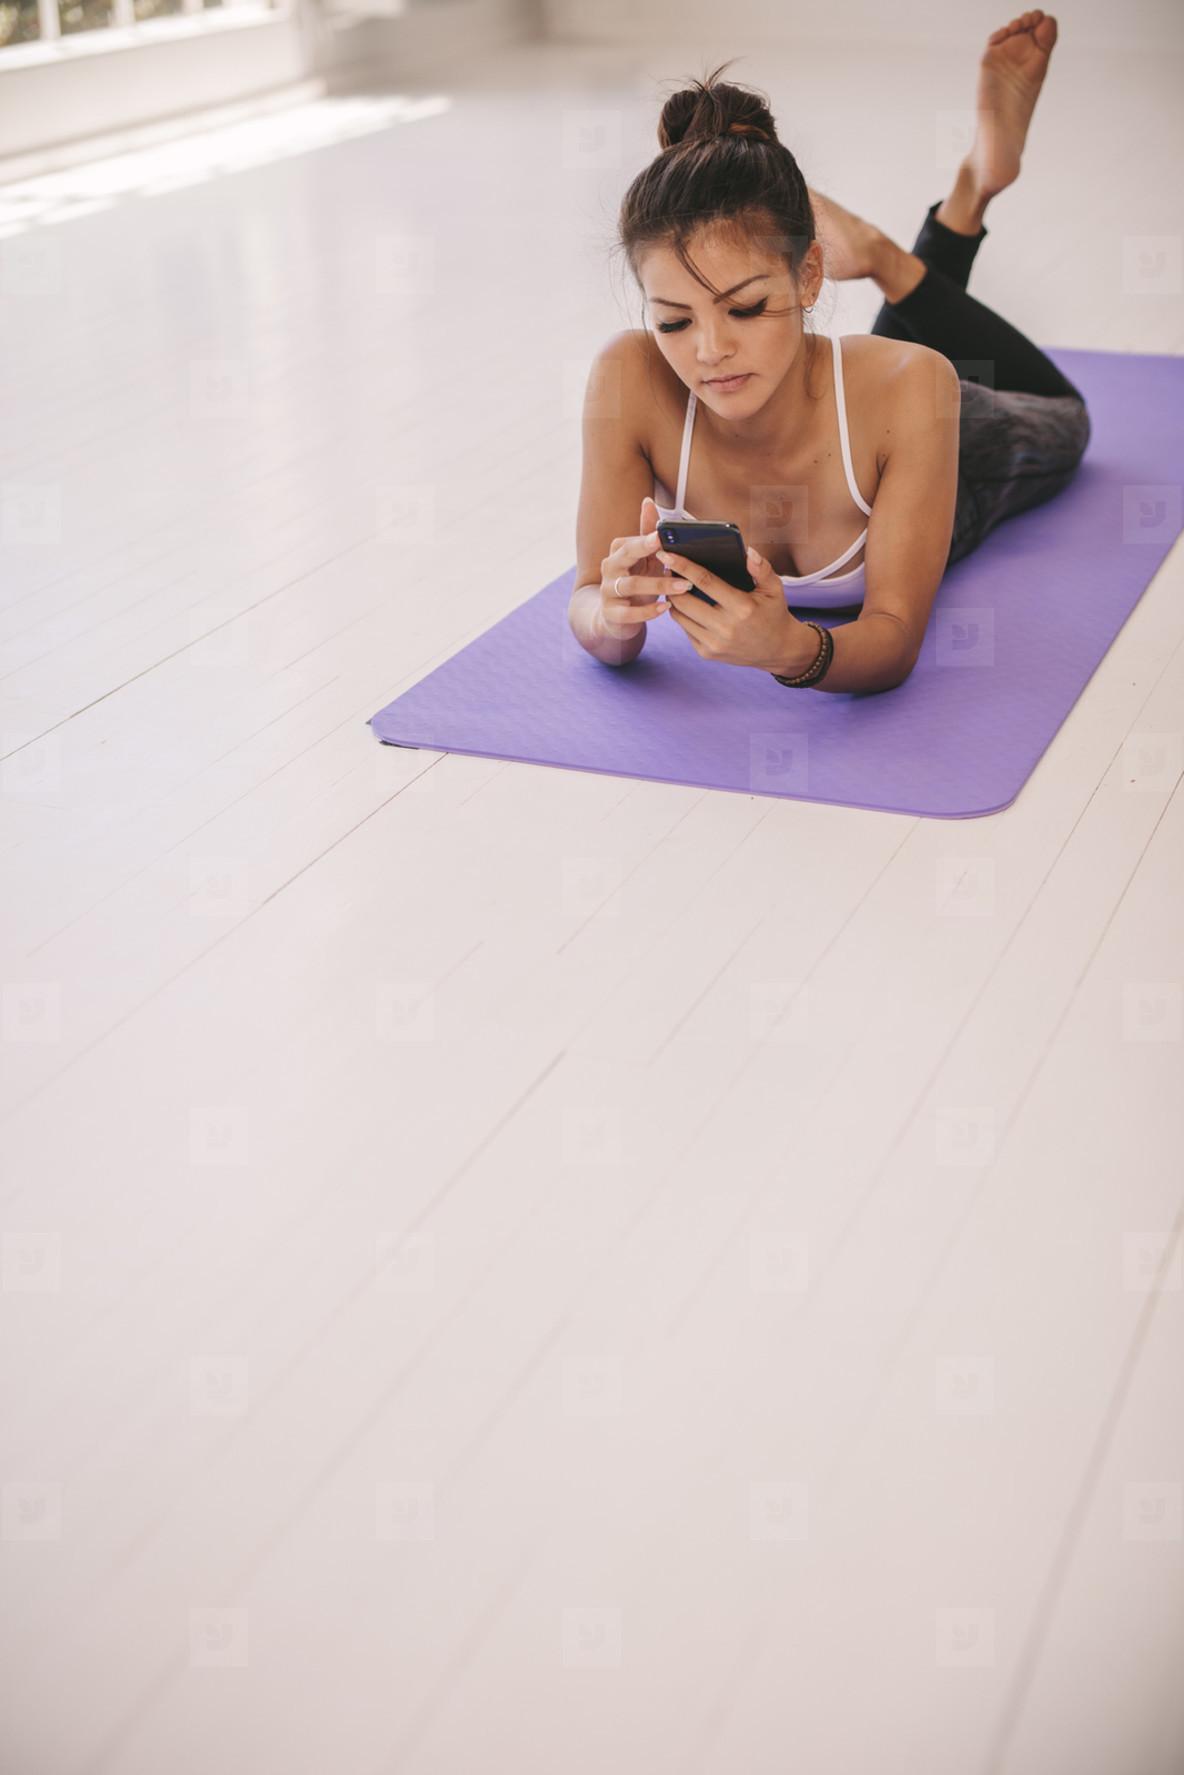 Woman lying on yoga mat using mobile phone